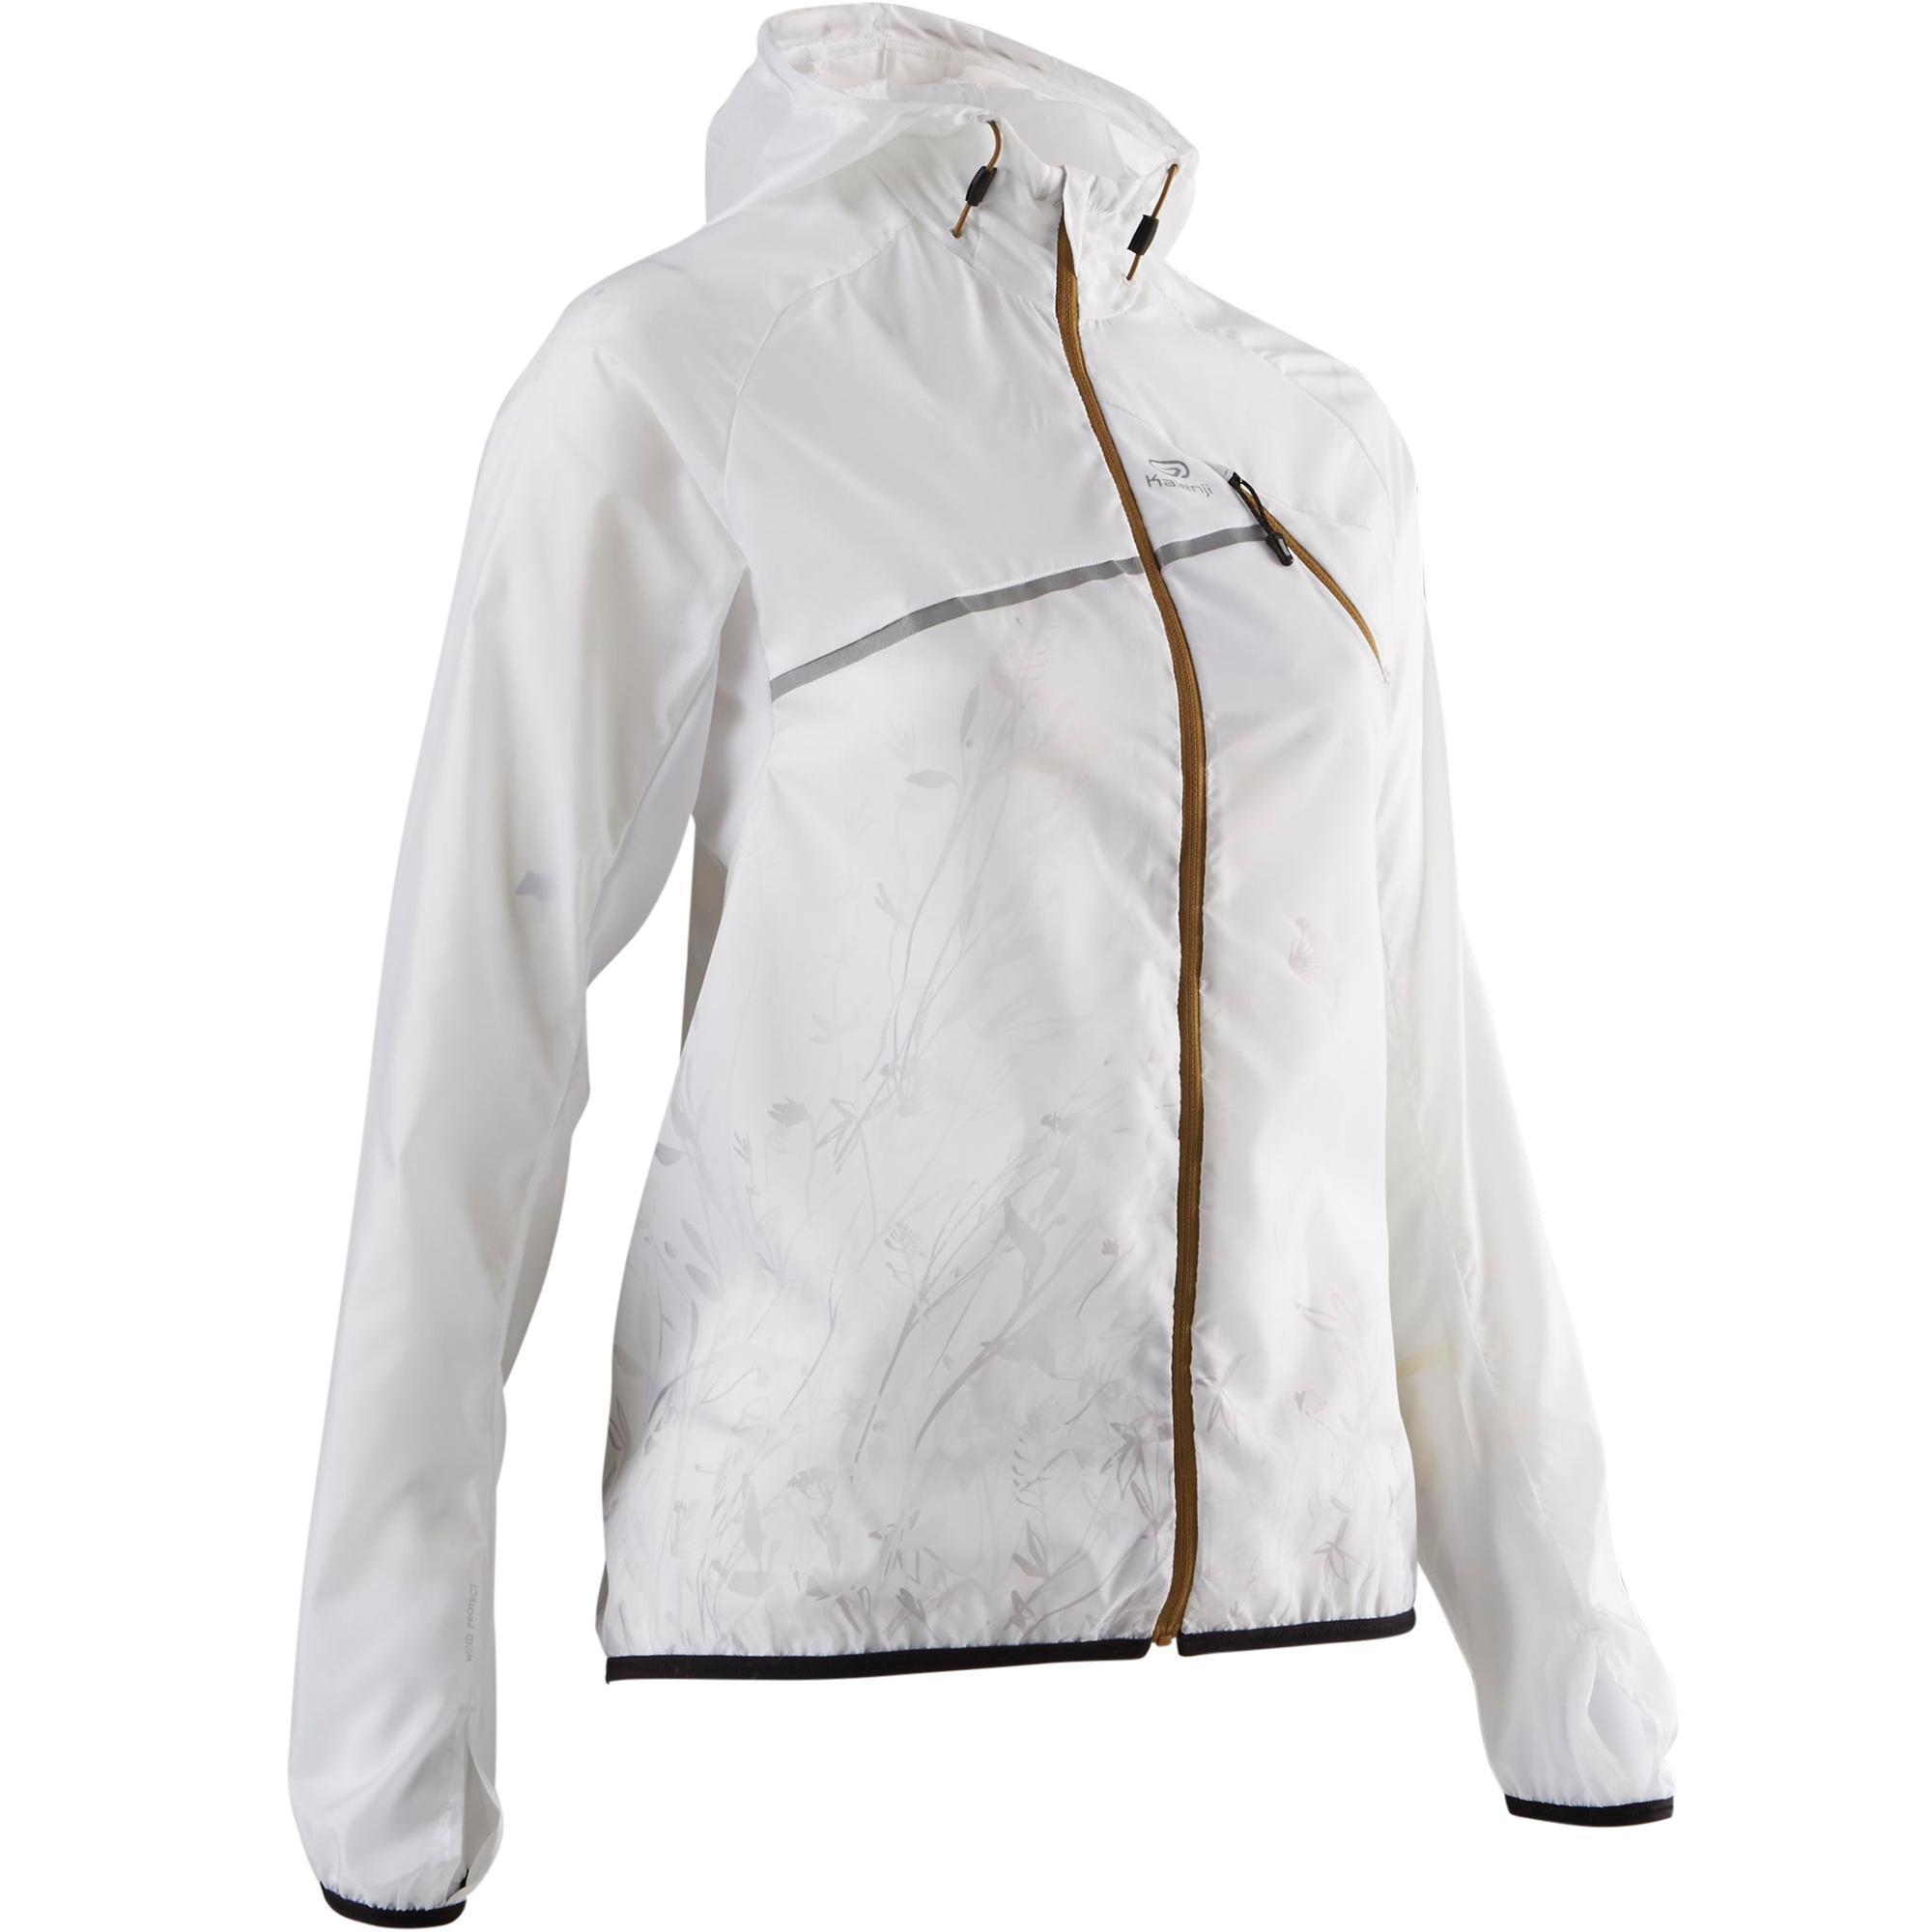 Lauf-Windjacke Trail Damen weiß | Sportbekleidung > Sportjacken > Windbreaker | Weiß | Kalenji